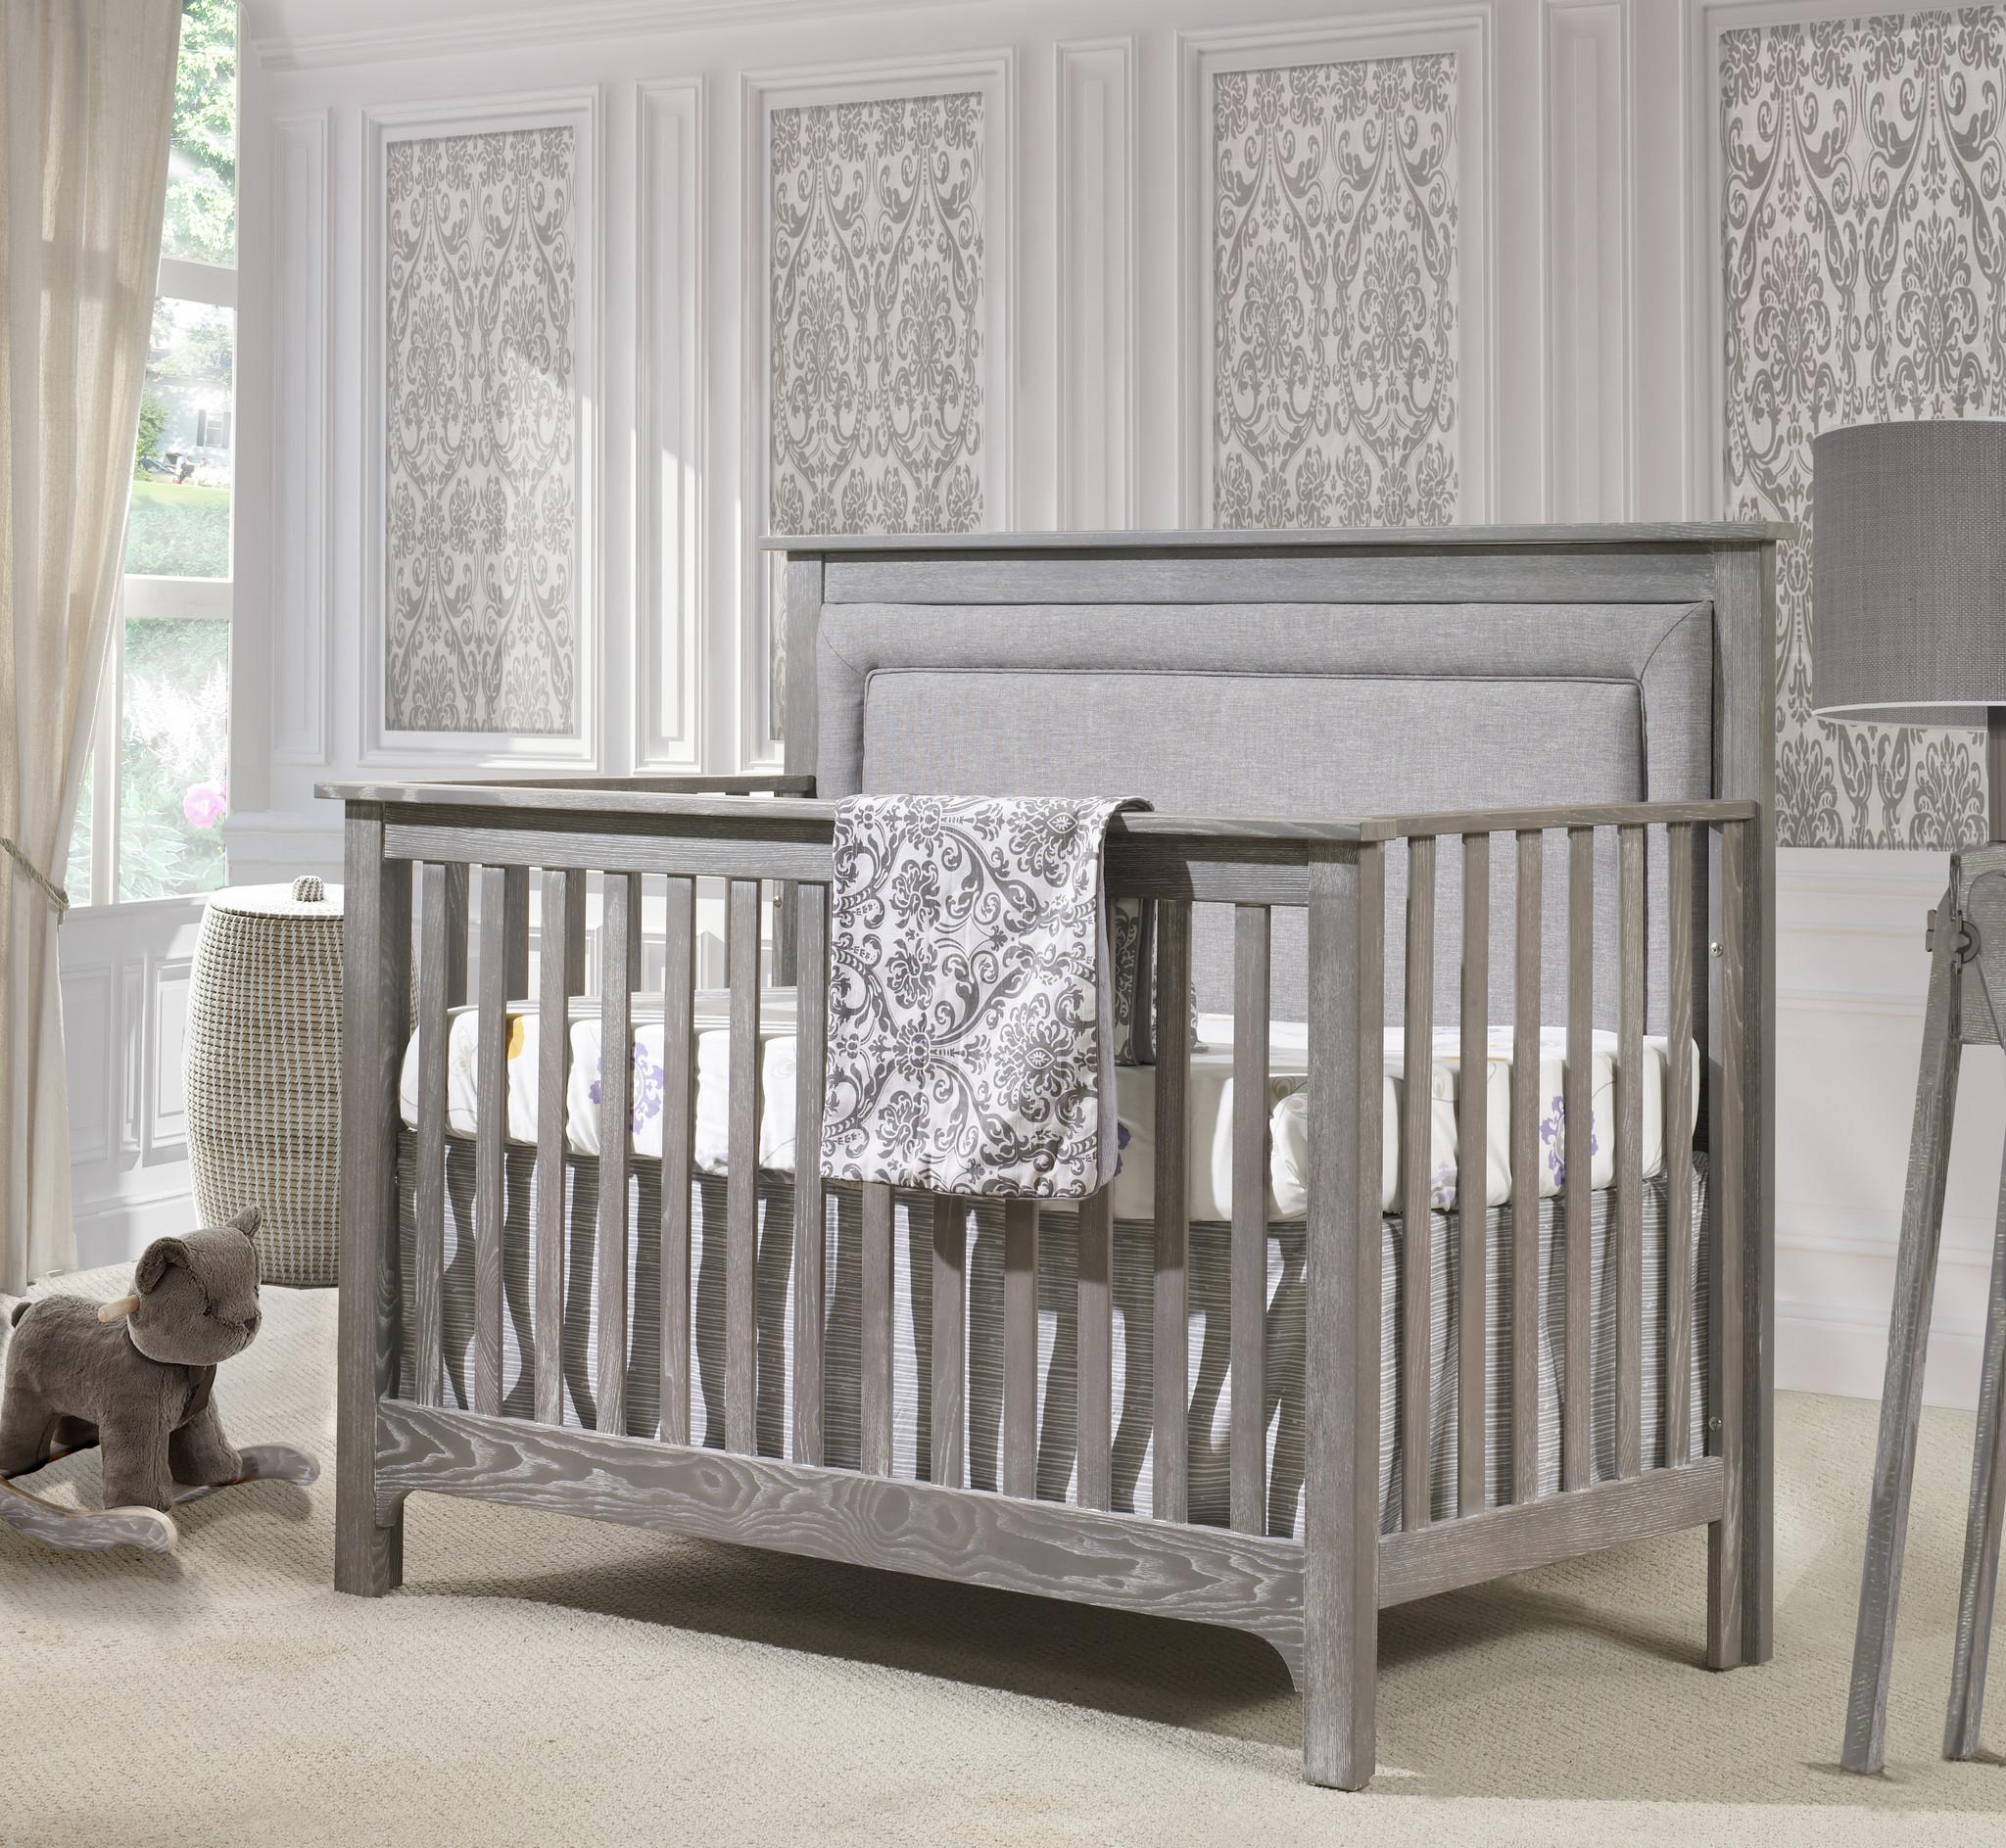 Nest Juvenile Emerson Crib w/ Upholstered Panel